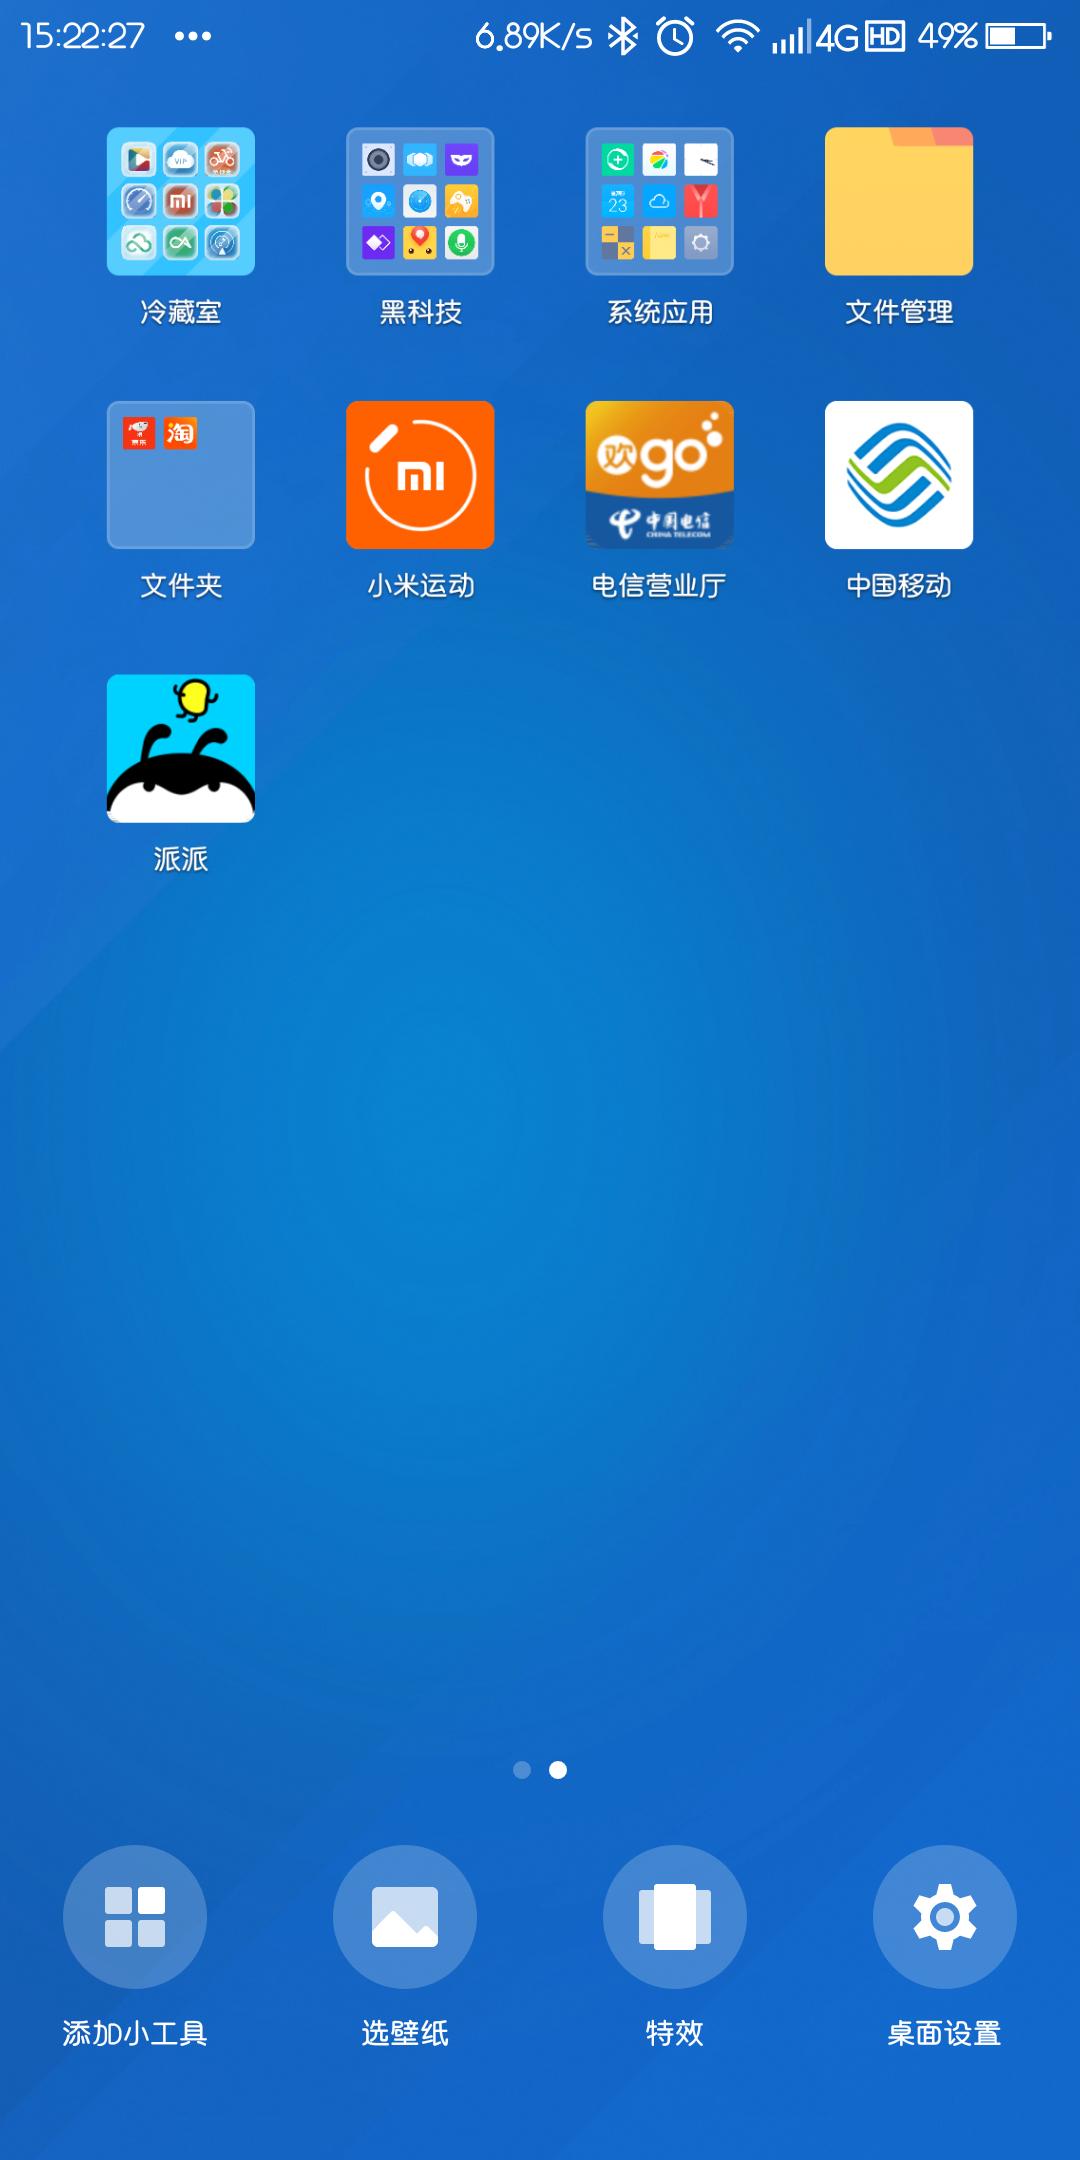 Screenshot_2018-09-23-15-22-28.png